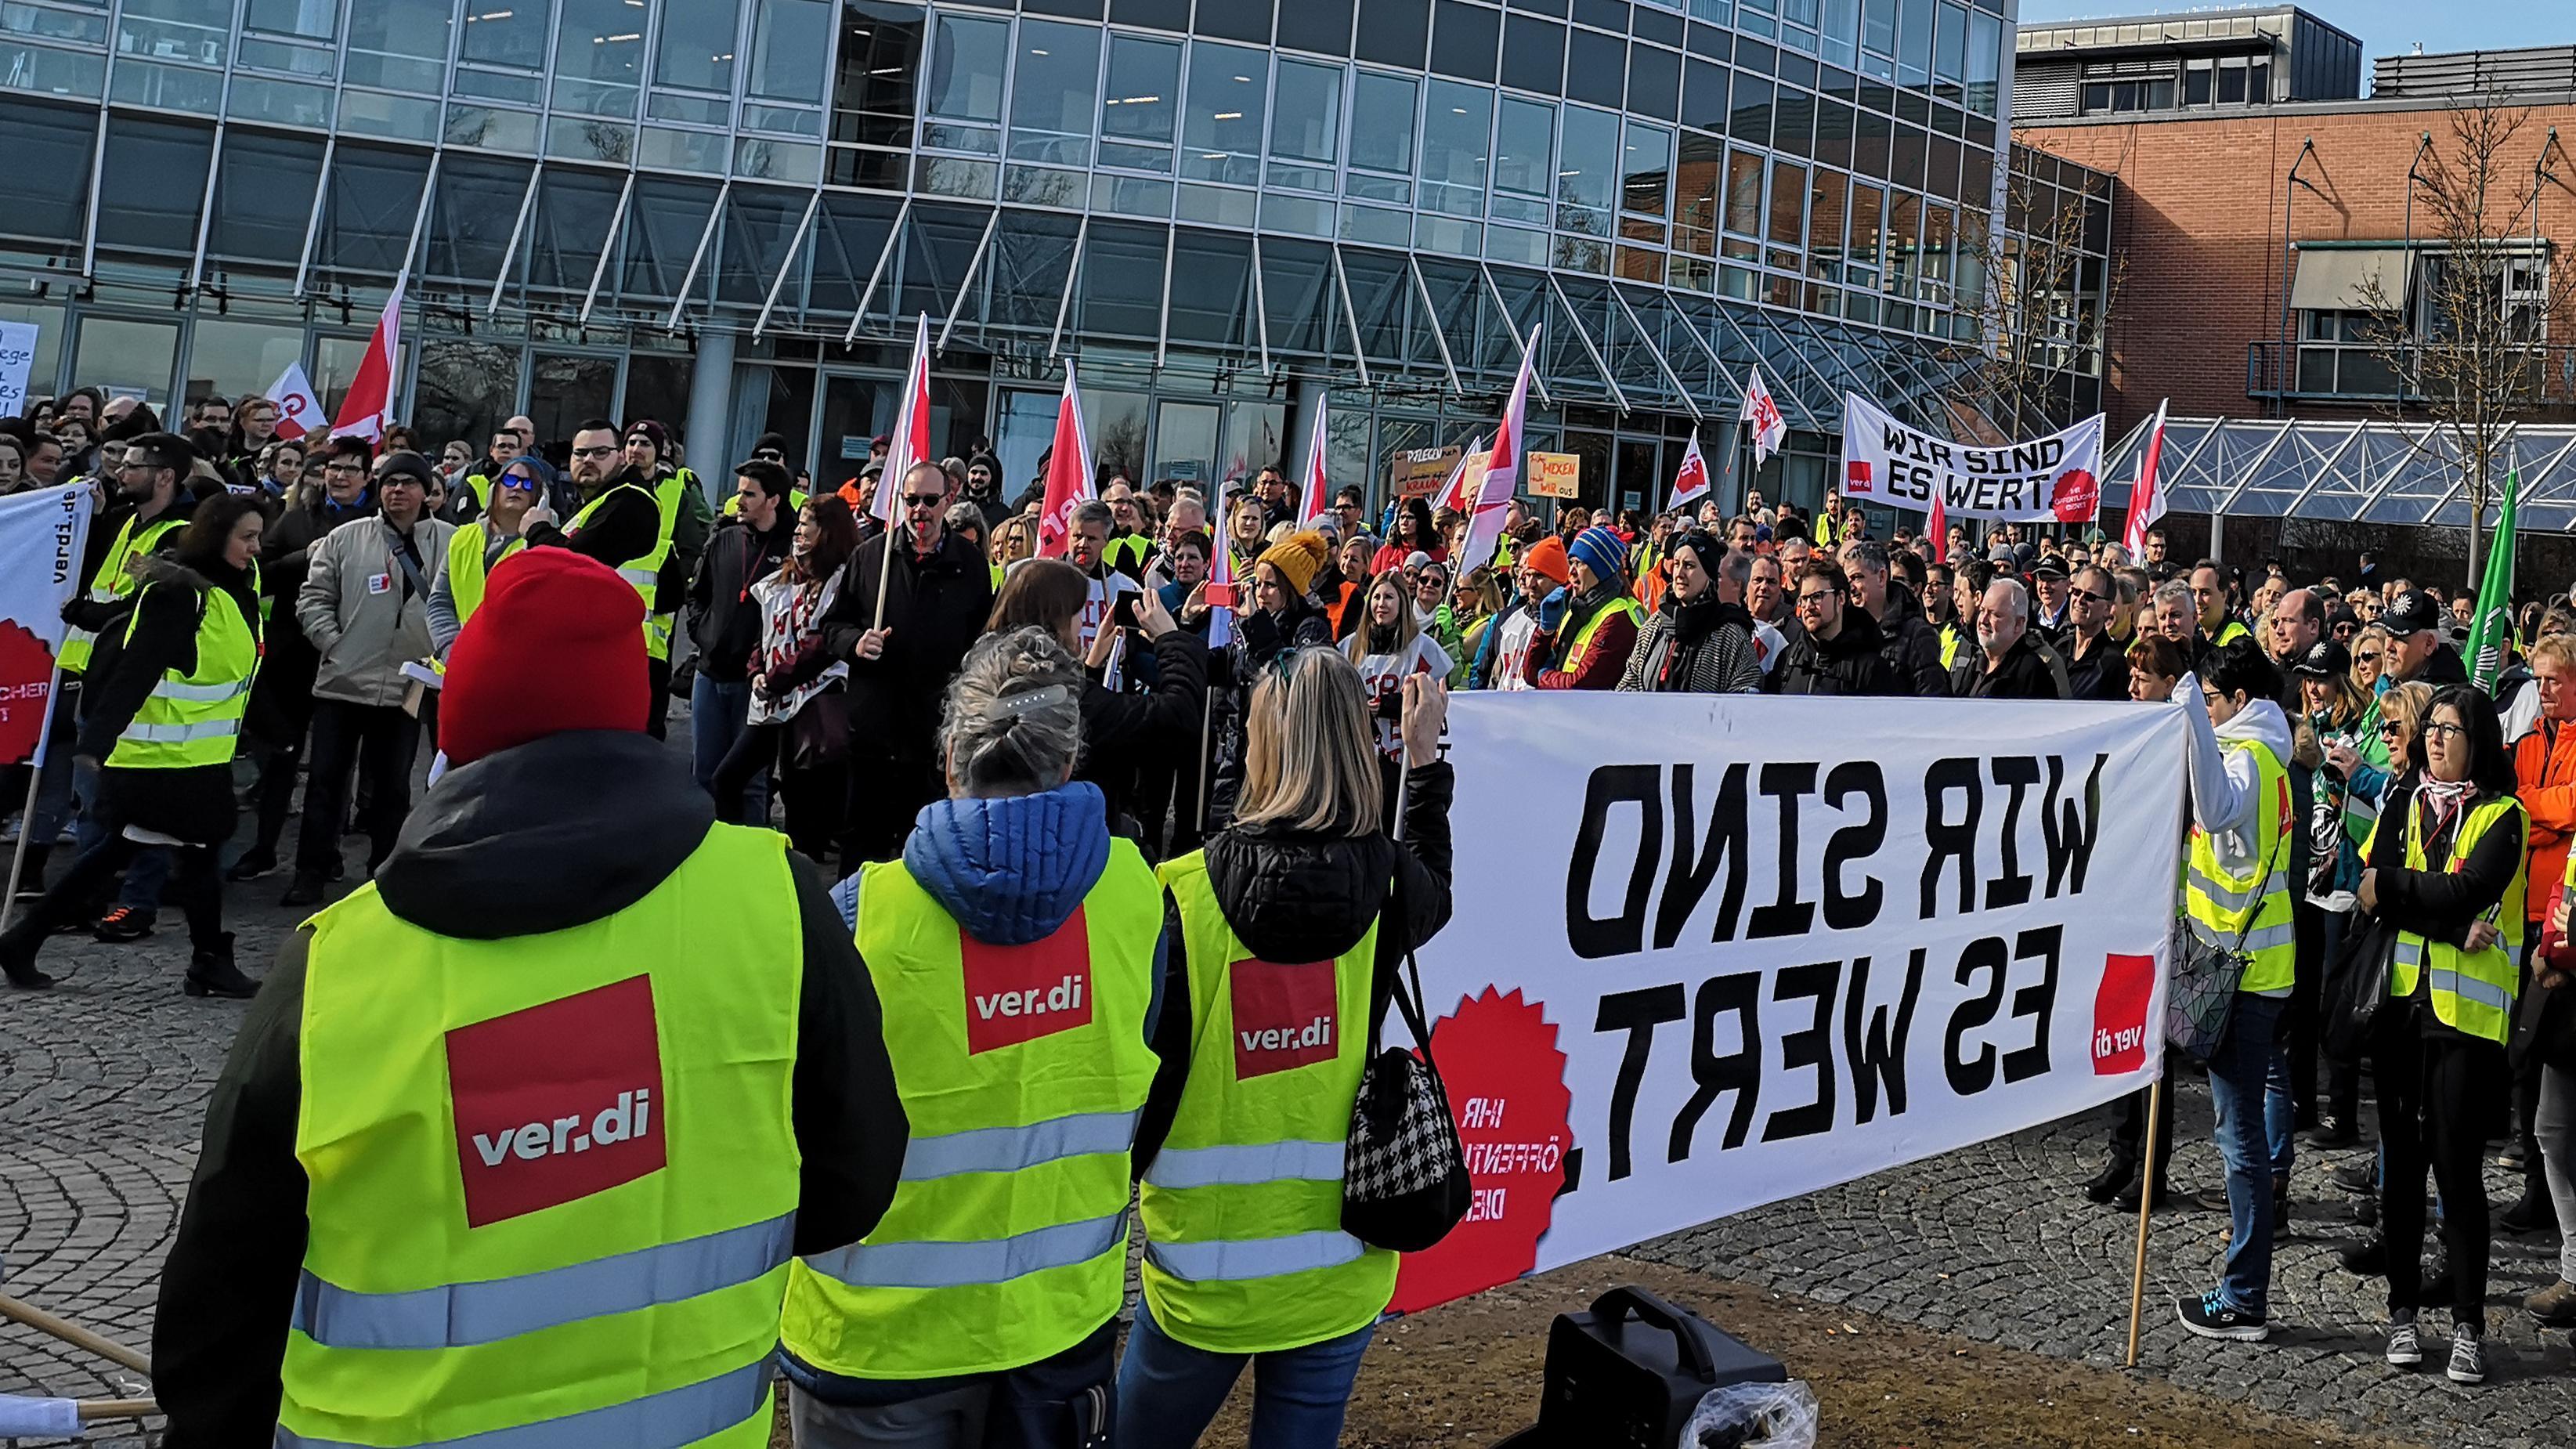 Streik-Kundgebung vor der Uniklinik in Regensburg